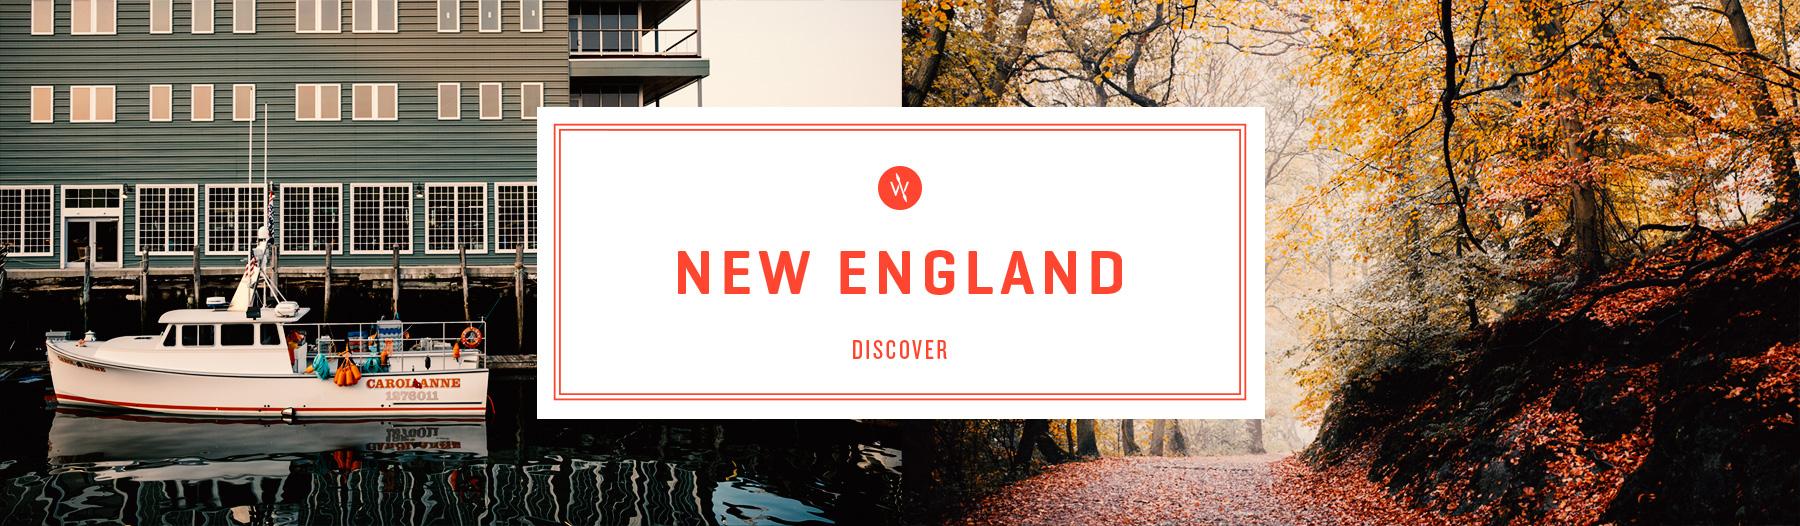 WILDSAM-New_England-HEADER.jpg